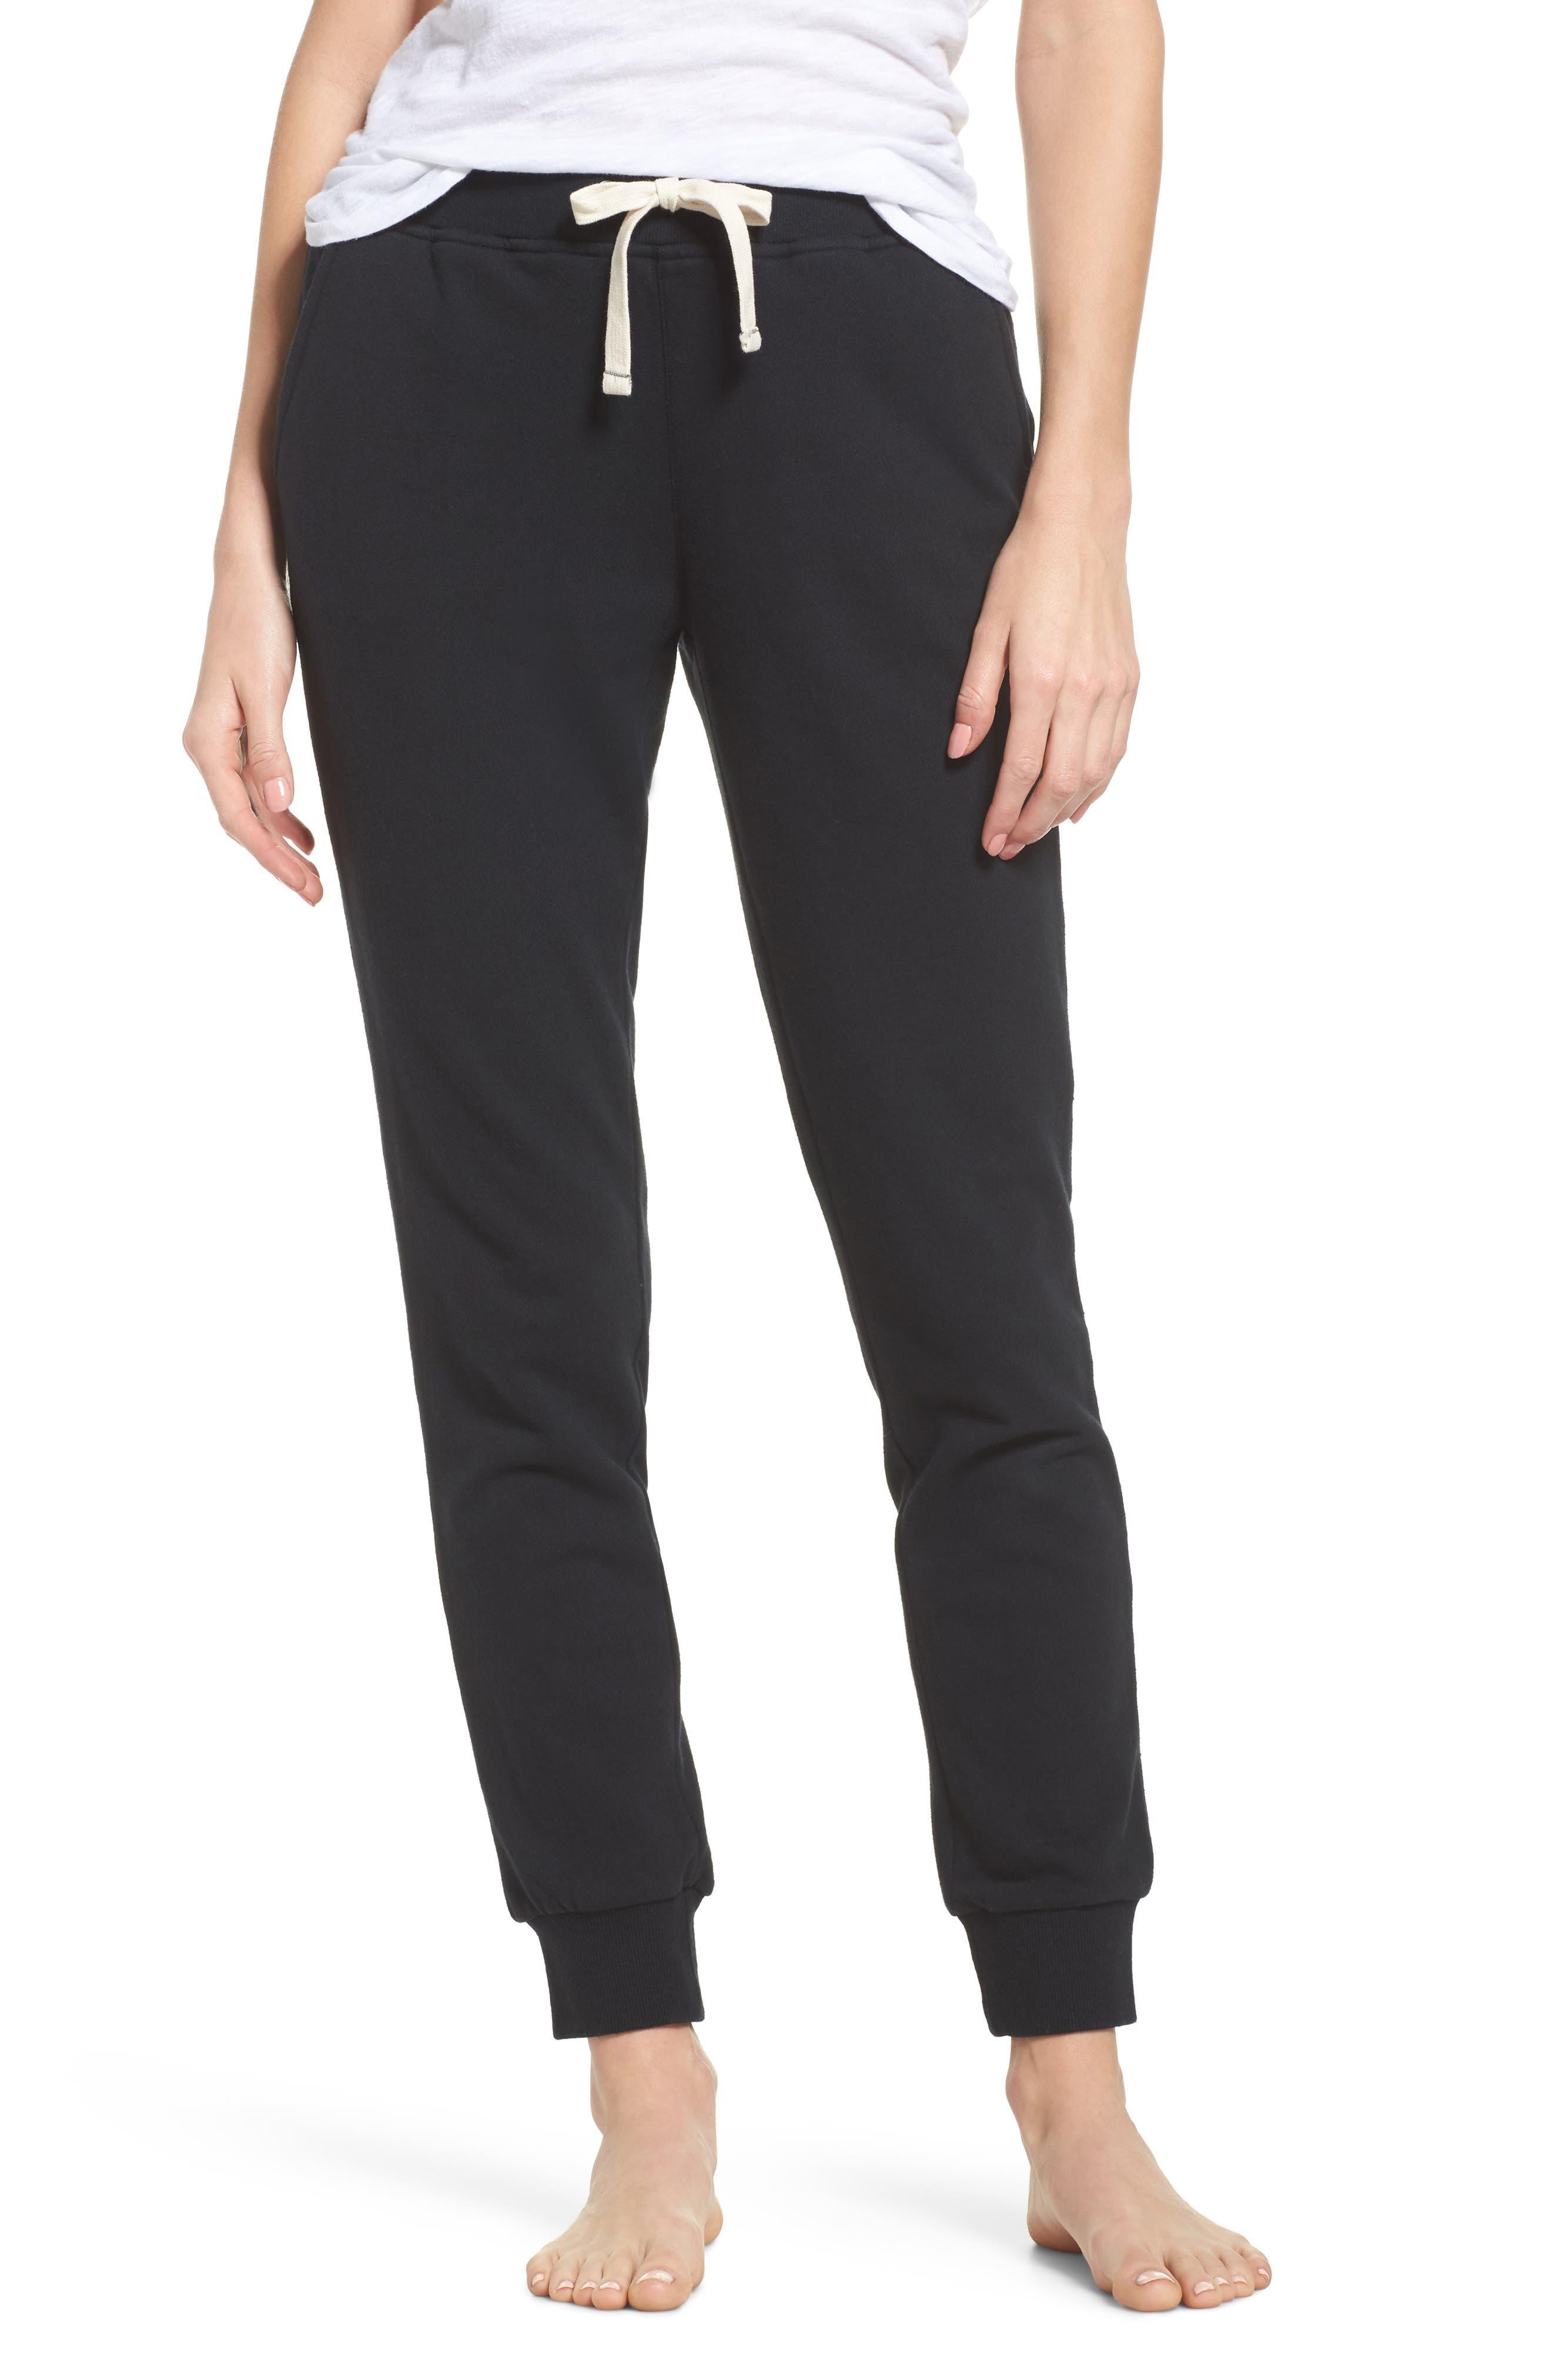 Babe Jogger Pants,                         Main,                         color, BLACK